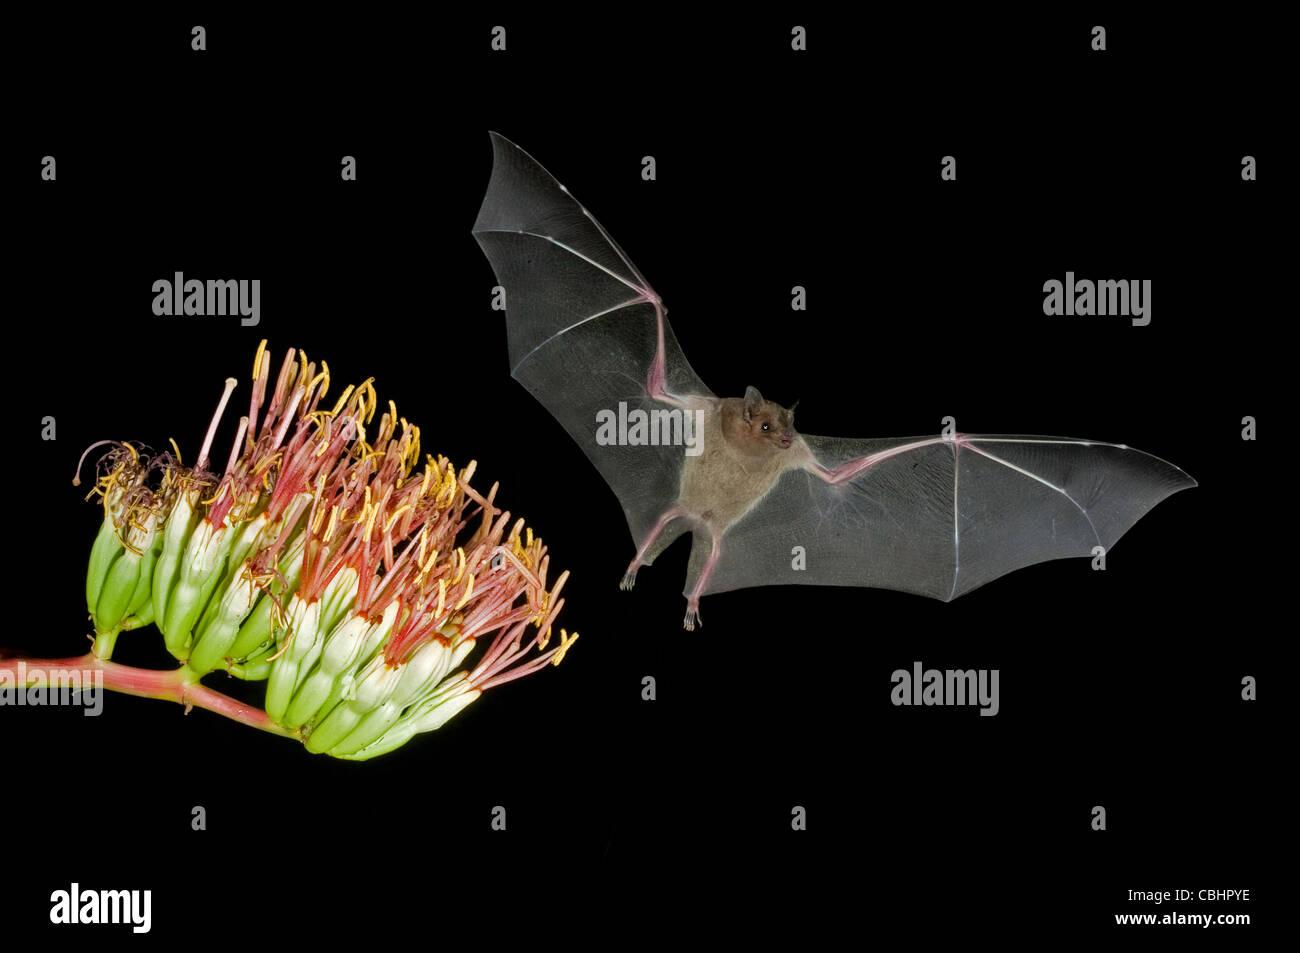 Bec long moindre Bat Leptonycteris curasoae Amado, Arizona, United States 23 août adulte à Parry's Photo Stock